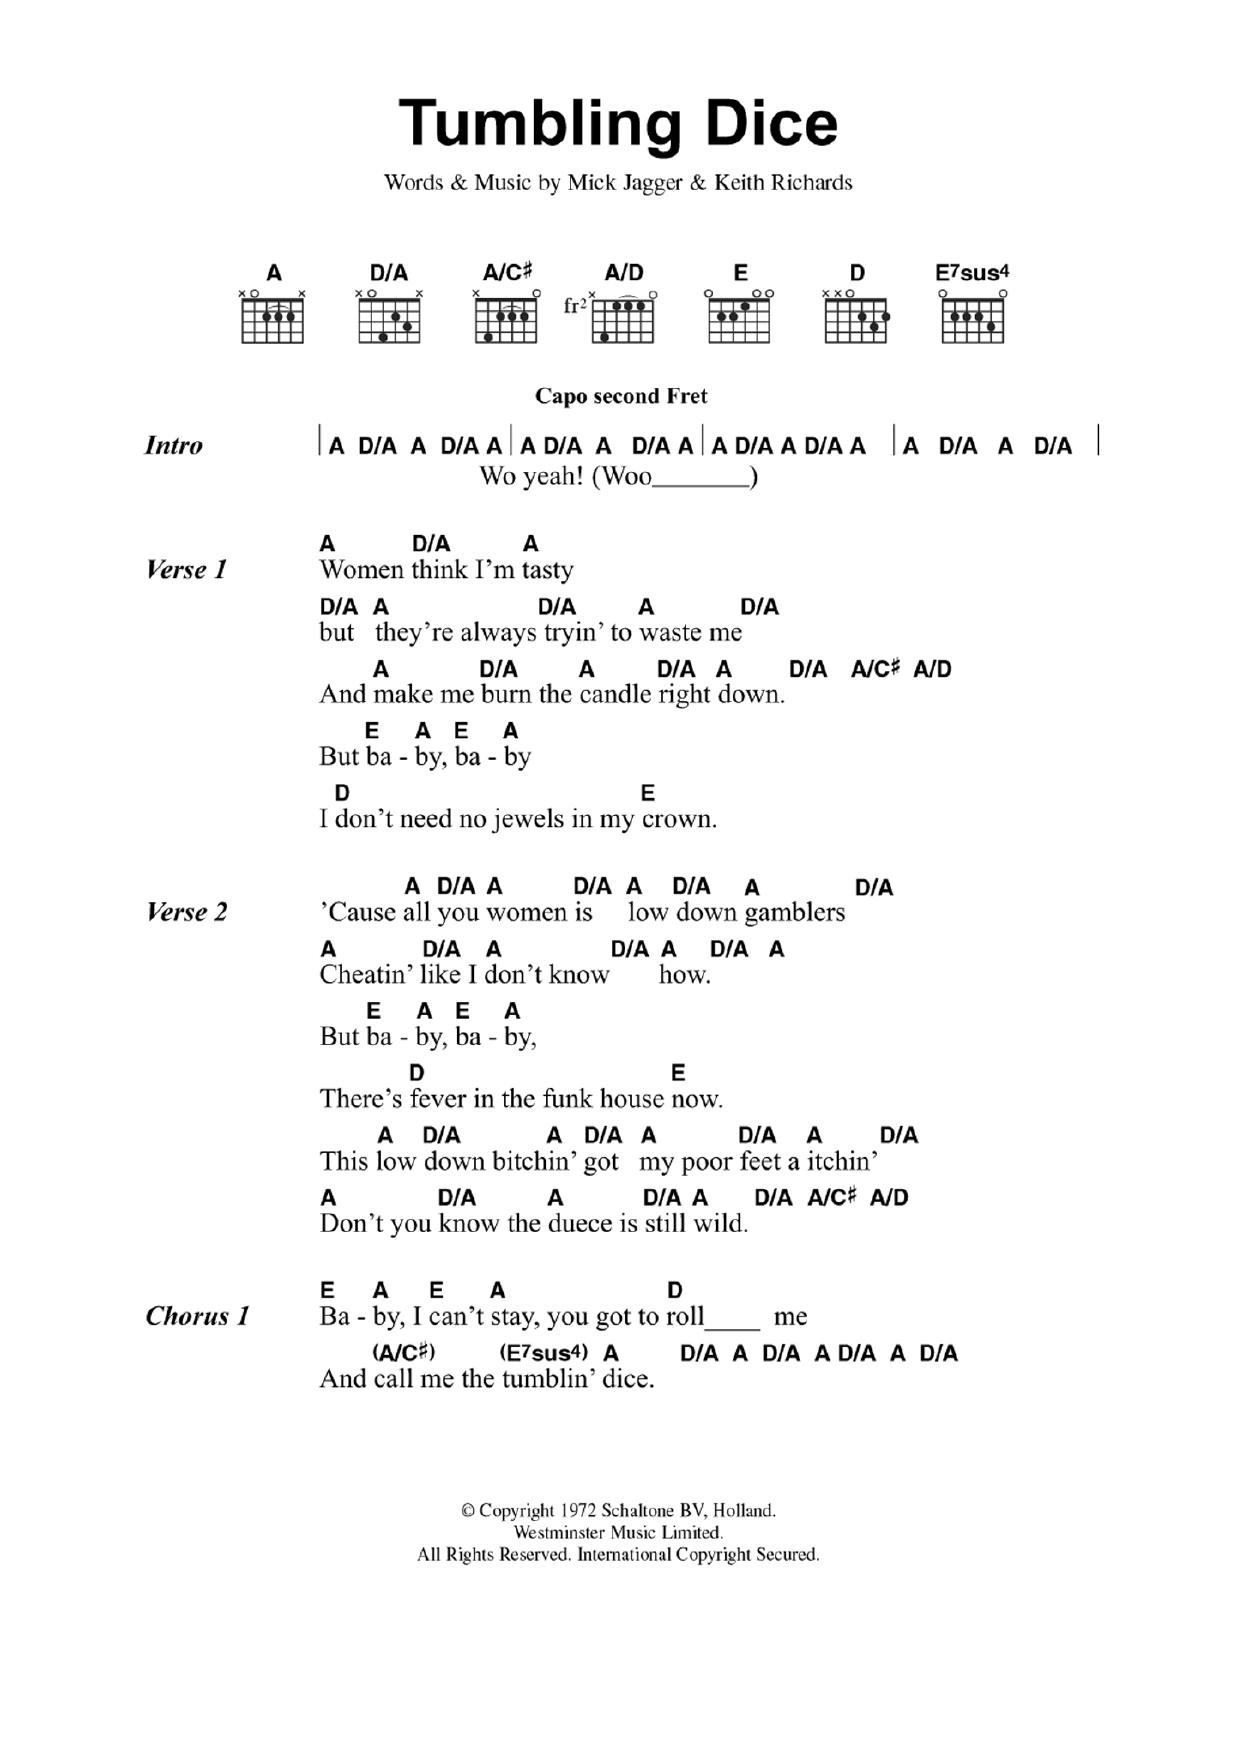 Tumbling Dice Sheet Music